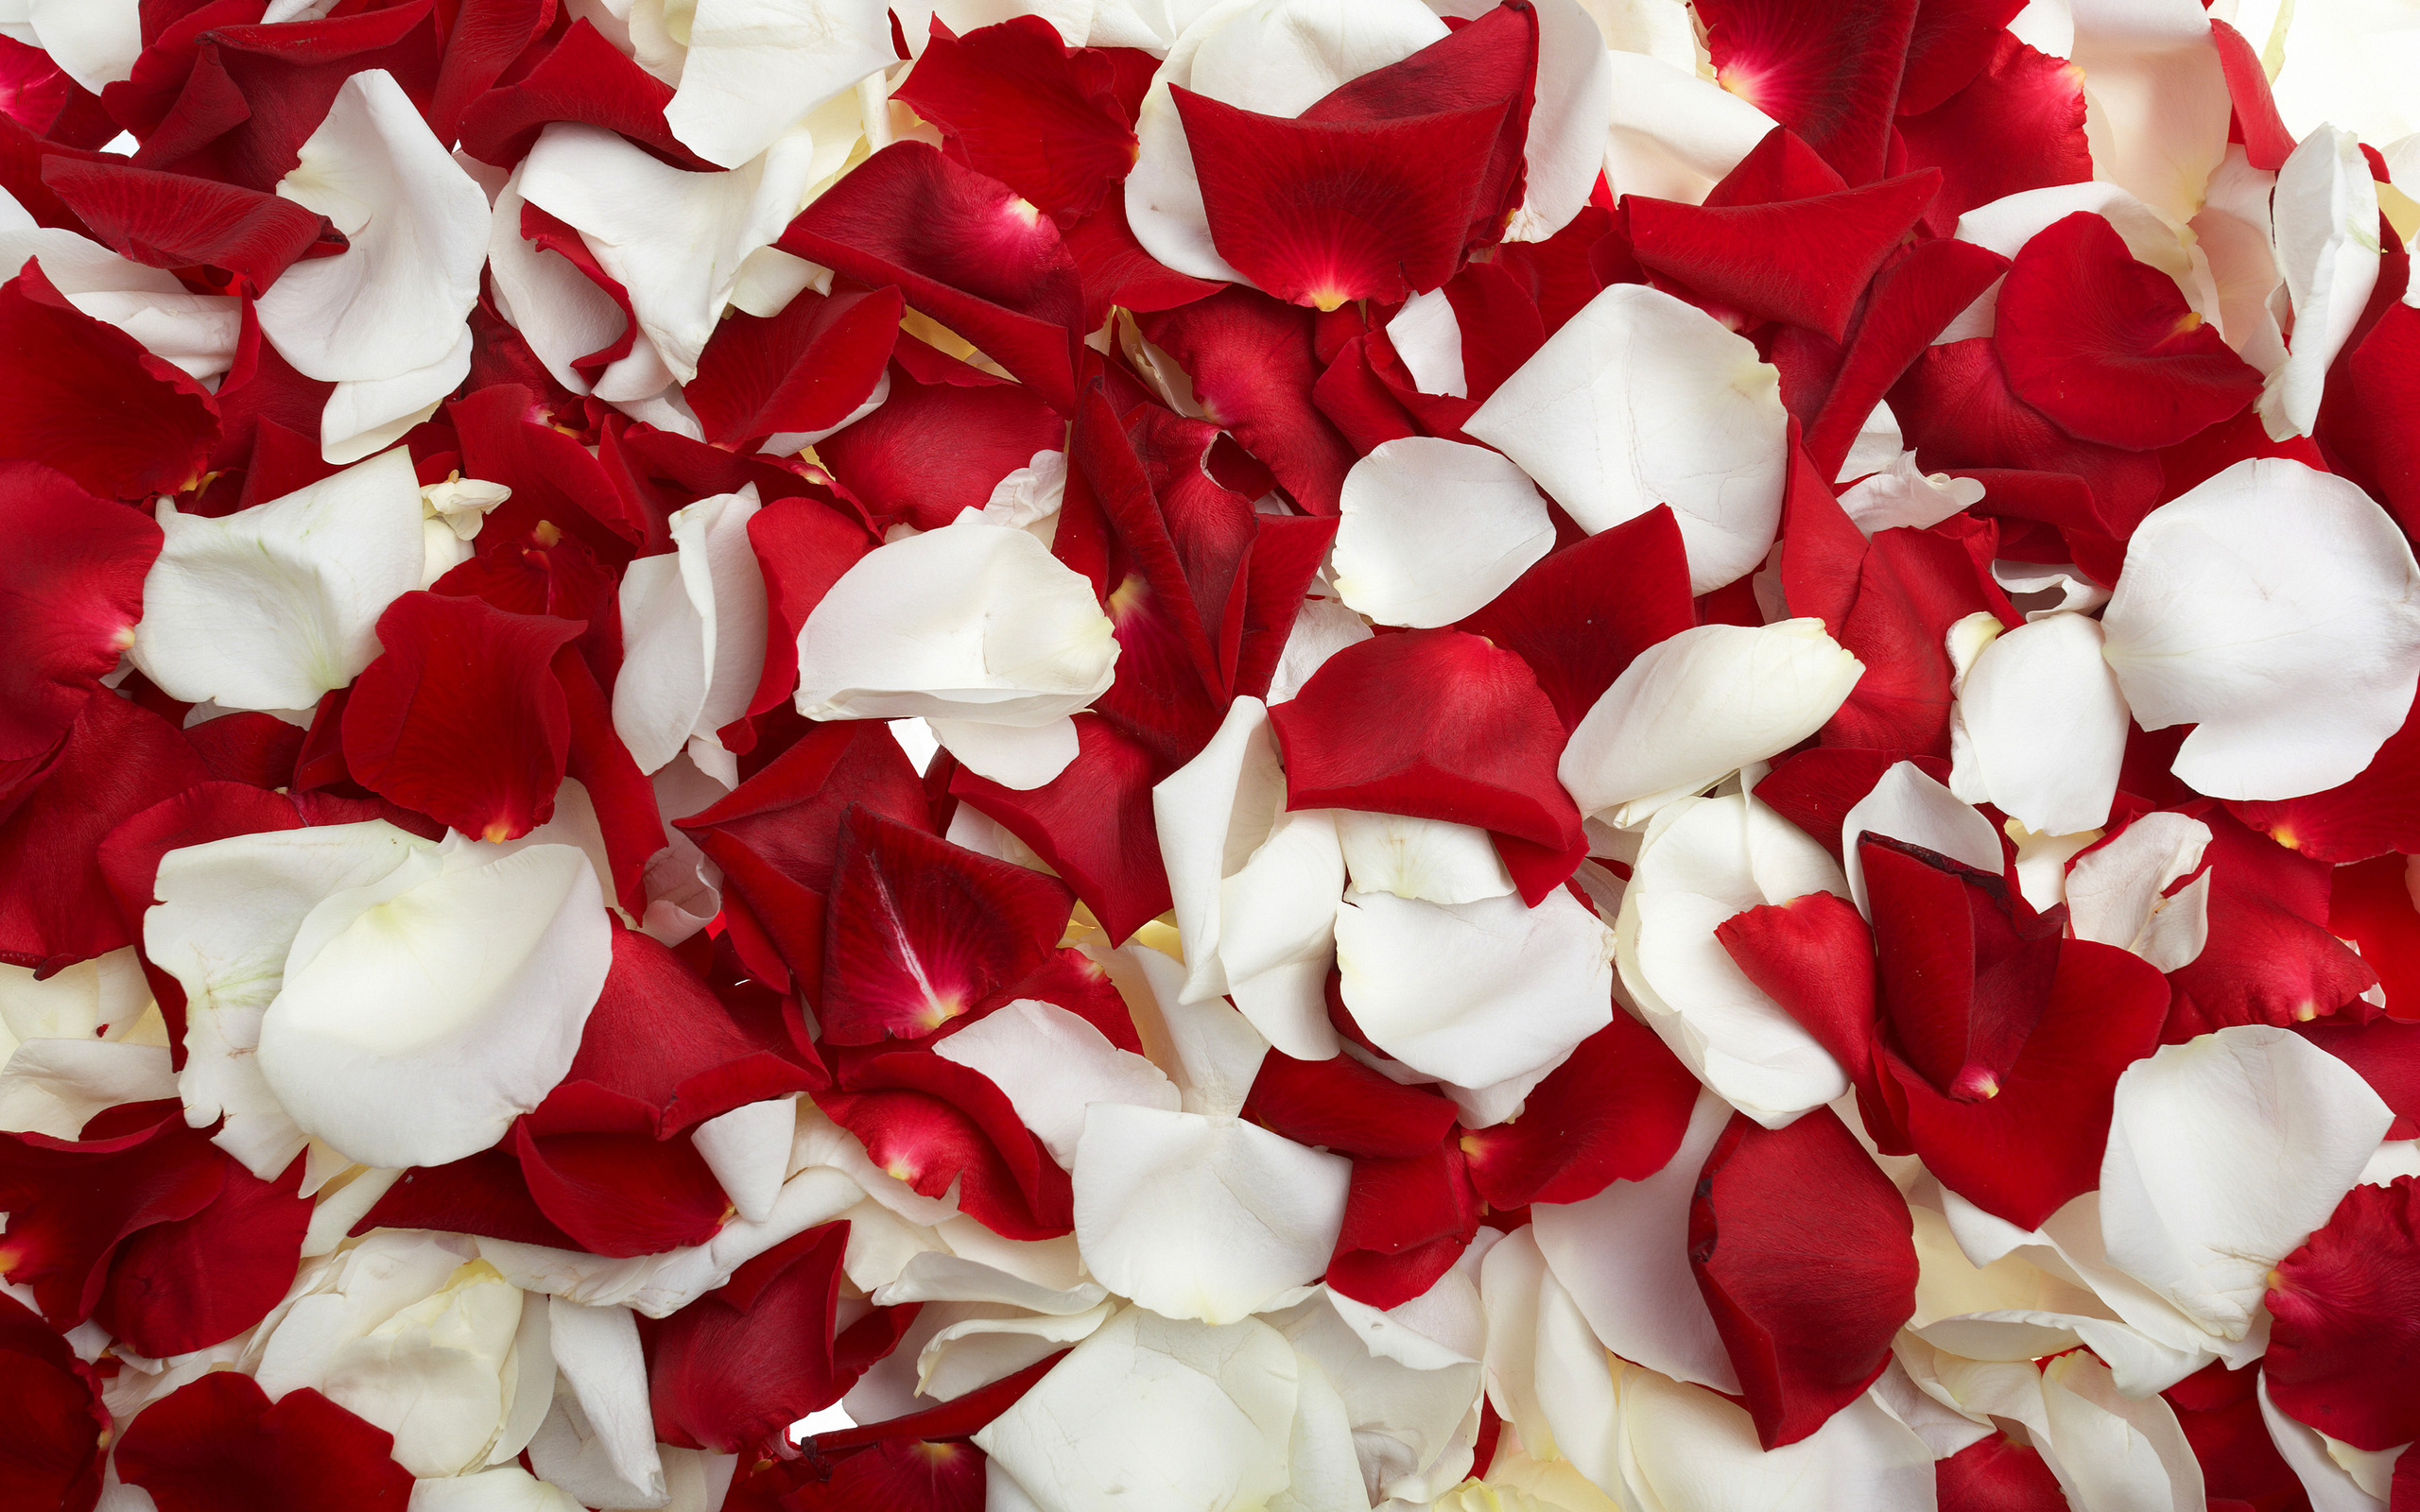 flower petal wallpaper 25884